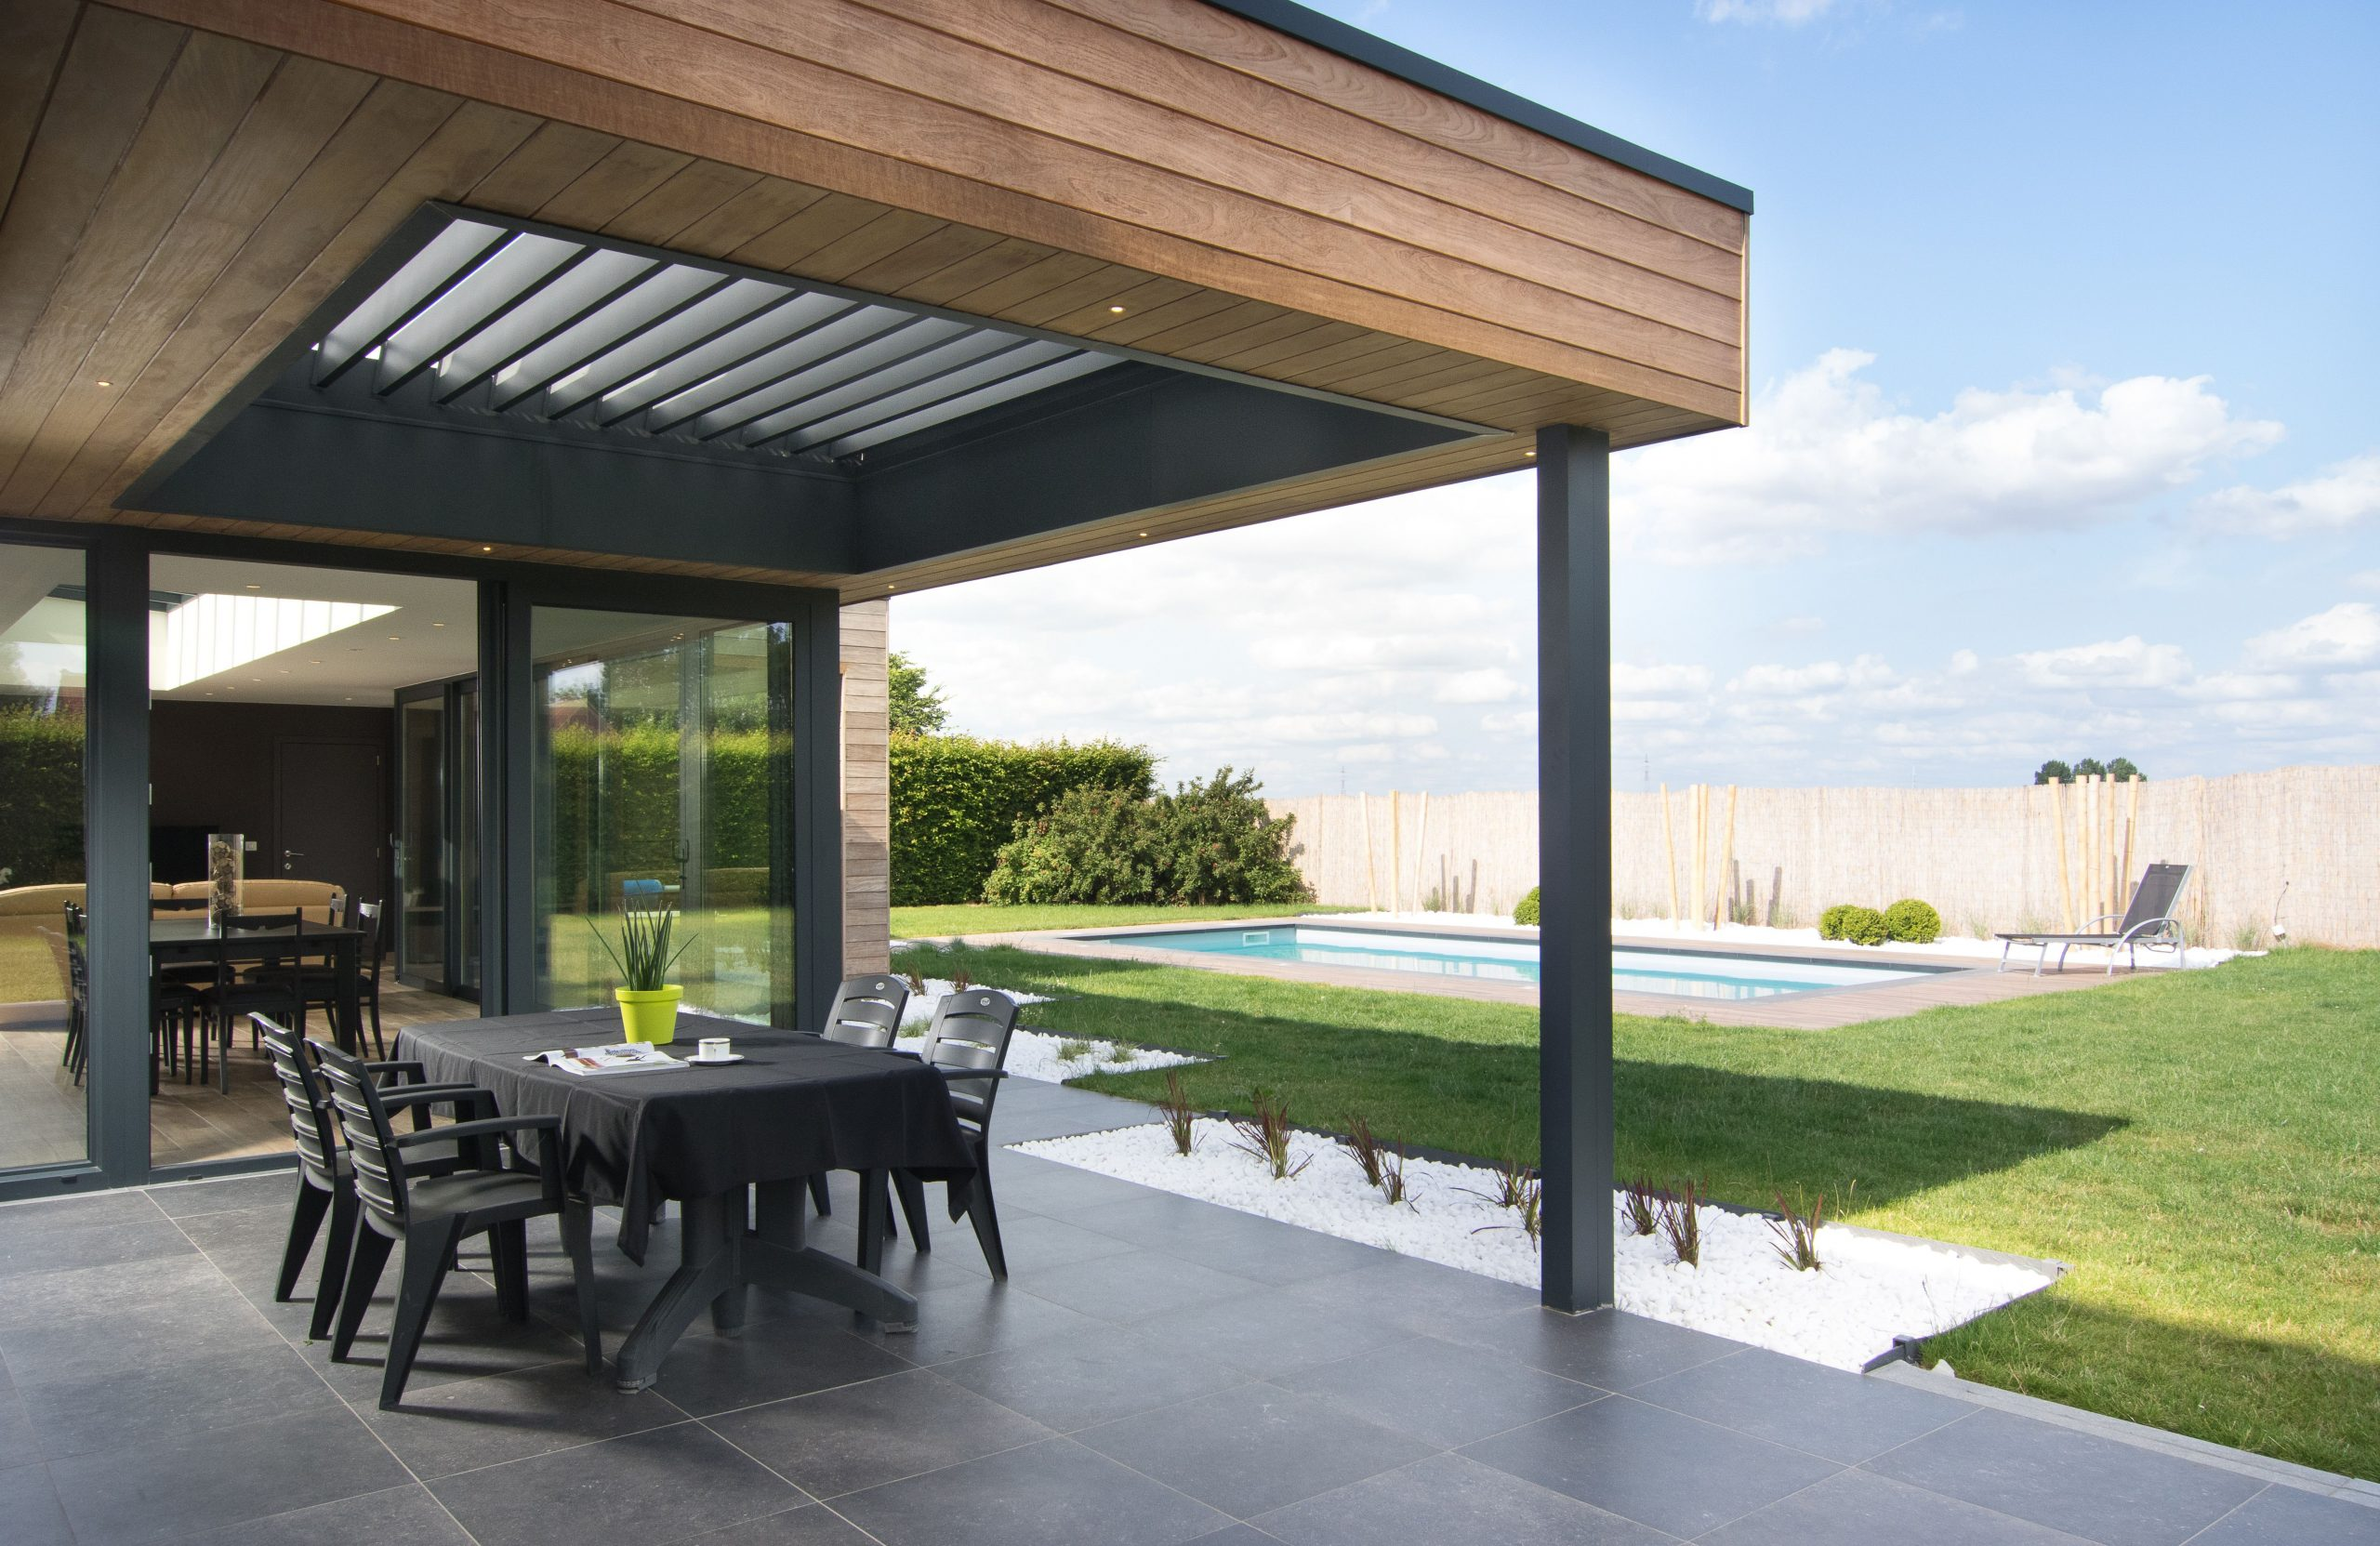 Overdekt Terras Met Geïntegreerde Beweegbare Lamellen ... concernant Terrasse Couverte Avec Poteaux Beton